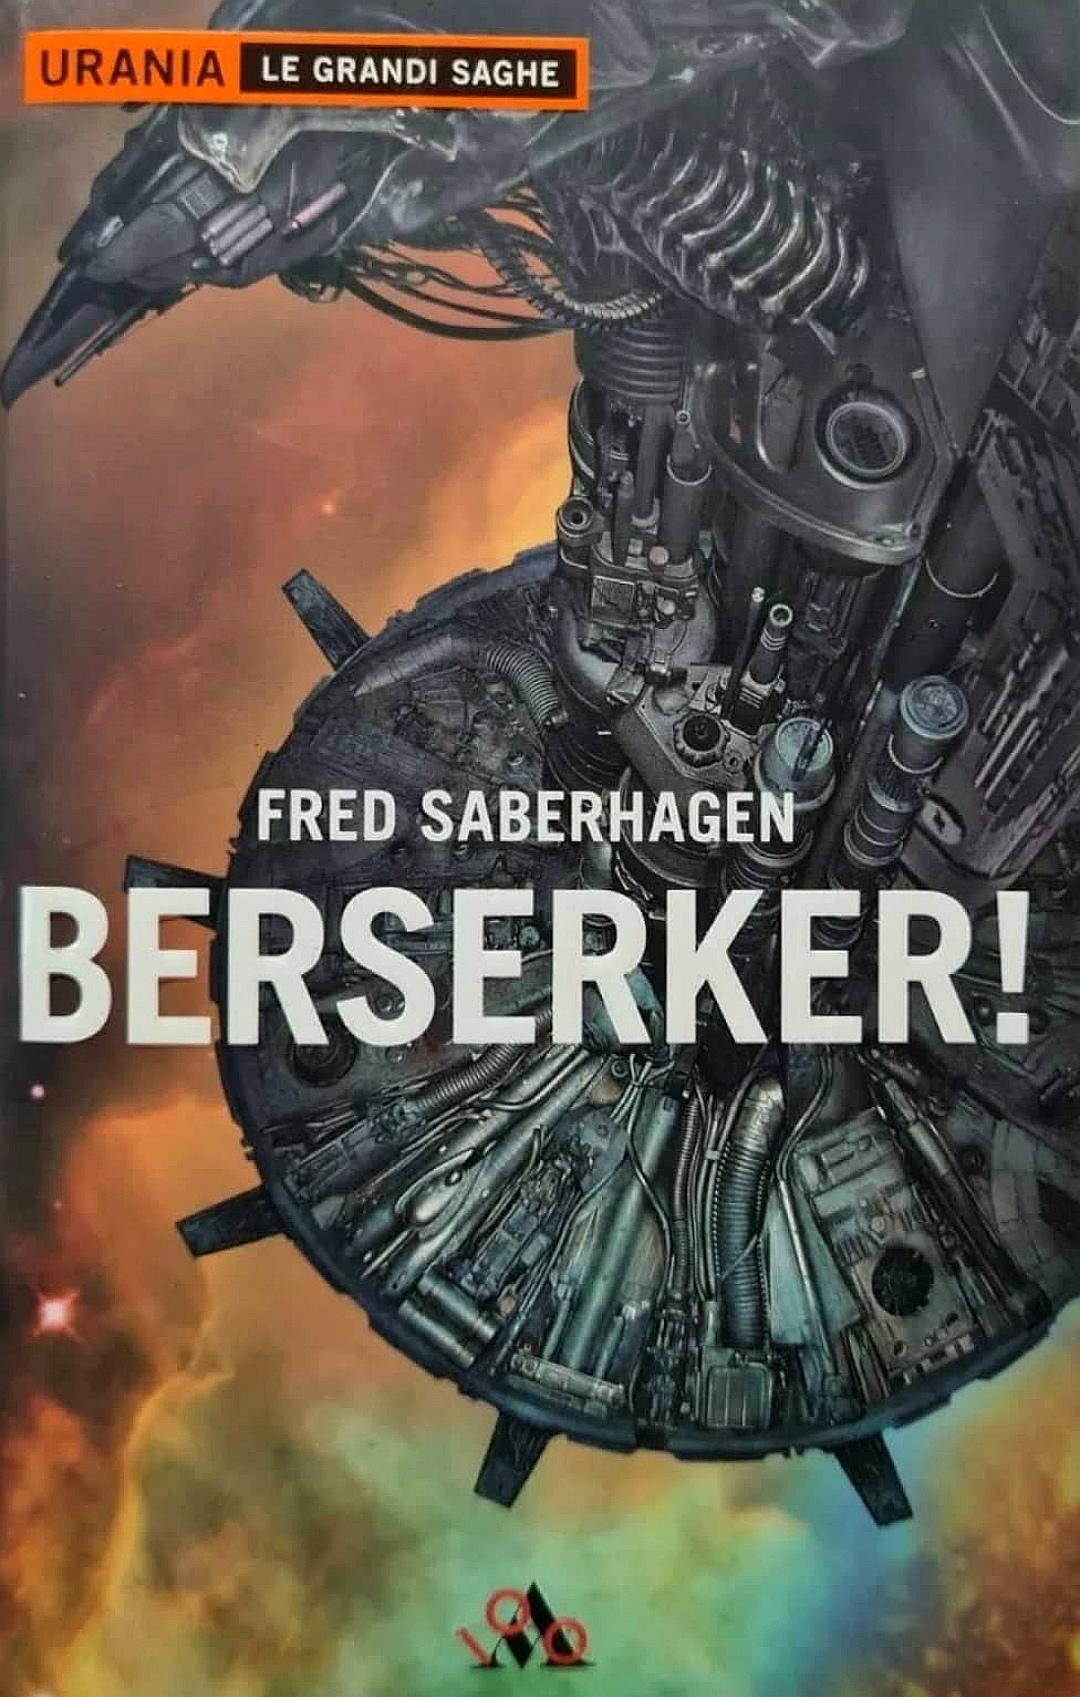 Berserker!